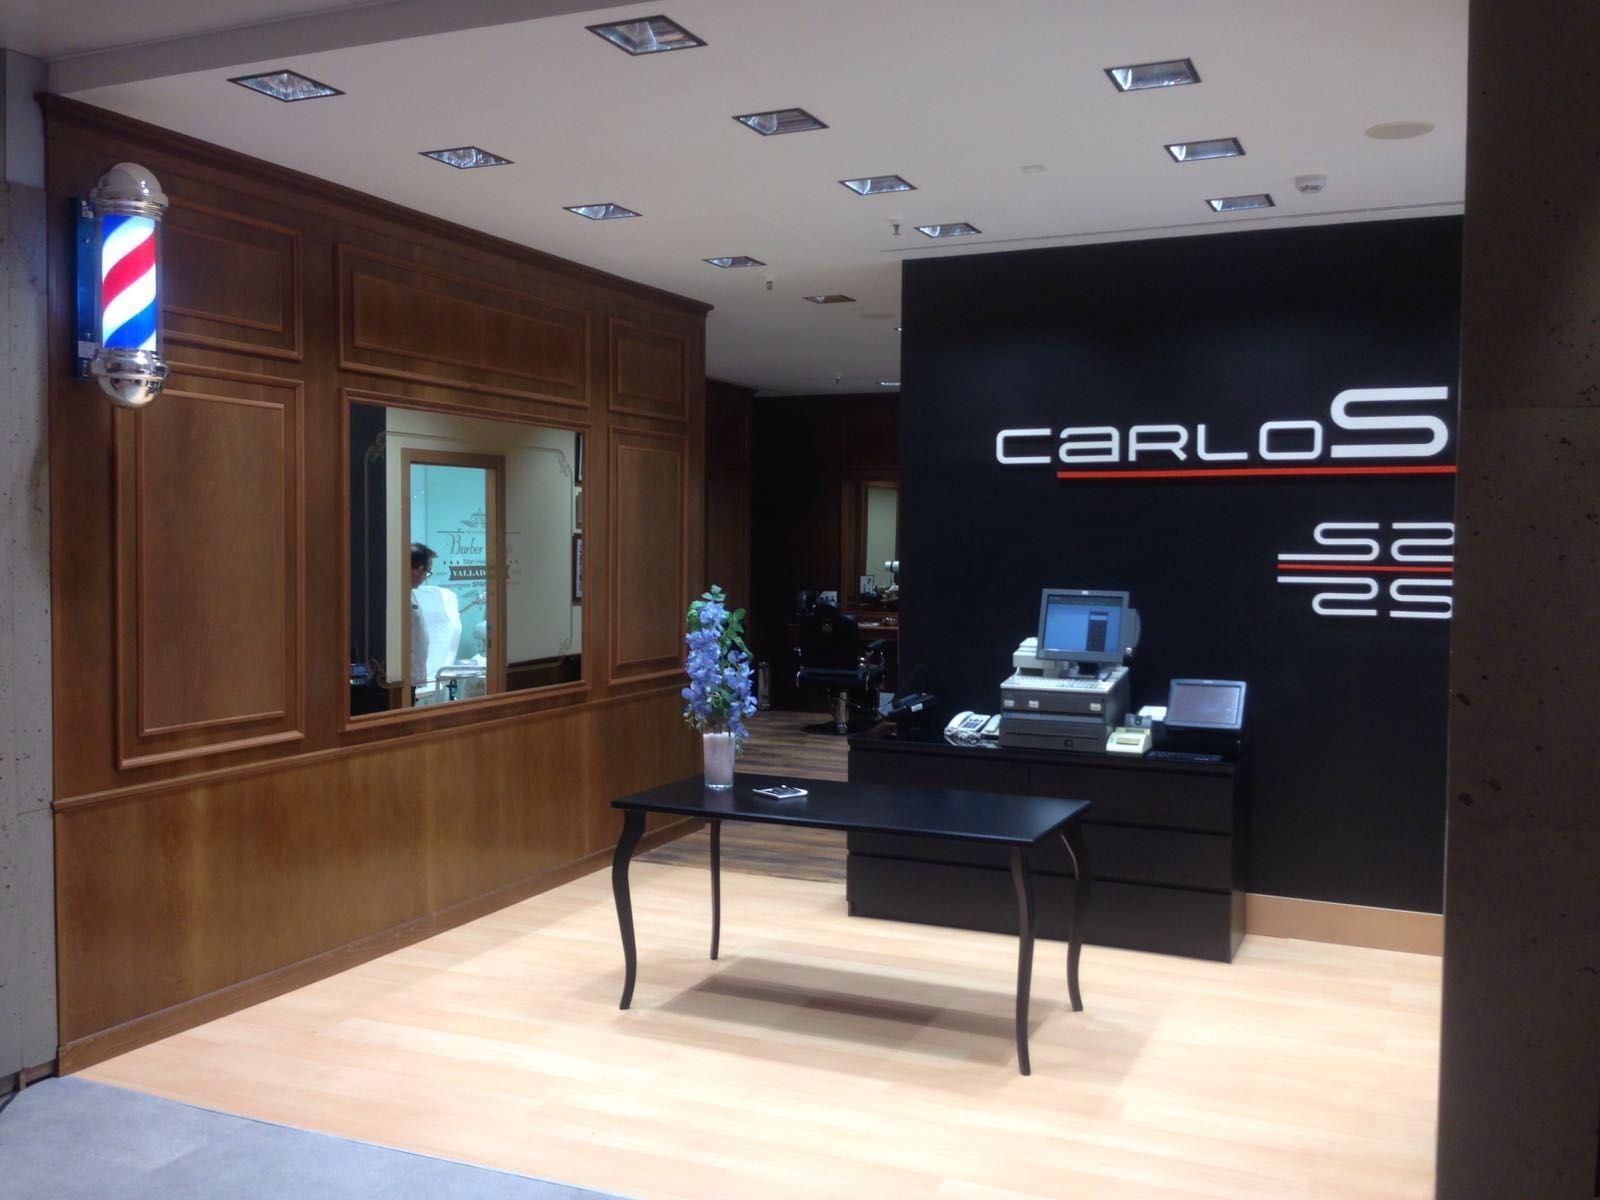 Nueva Peluqueria Carlos Spejos Corte Ingles De Valladolid Muebles  # Muebles Peluqueria